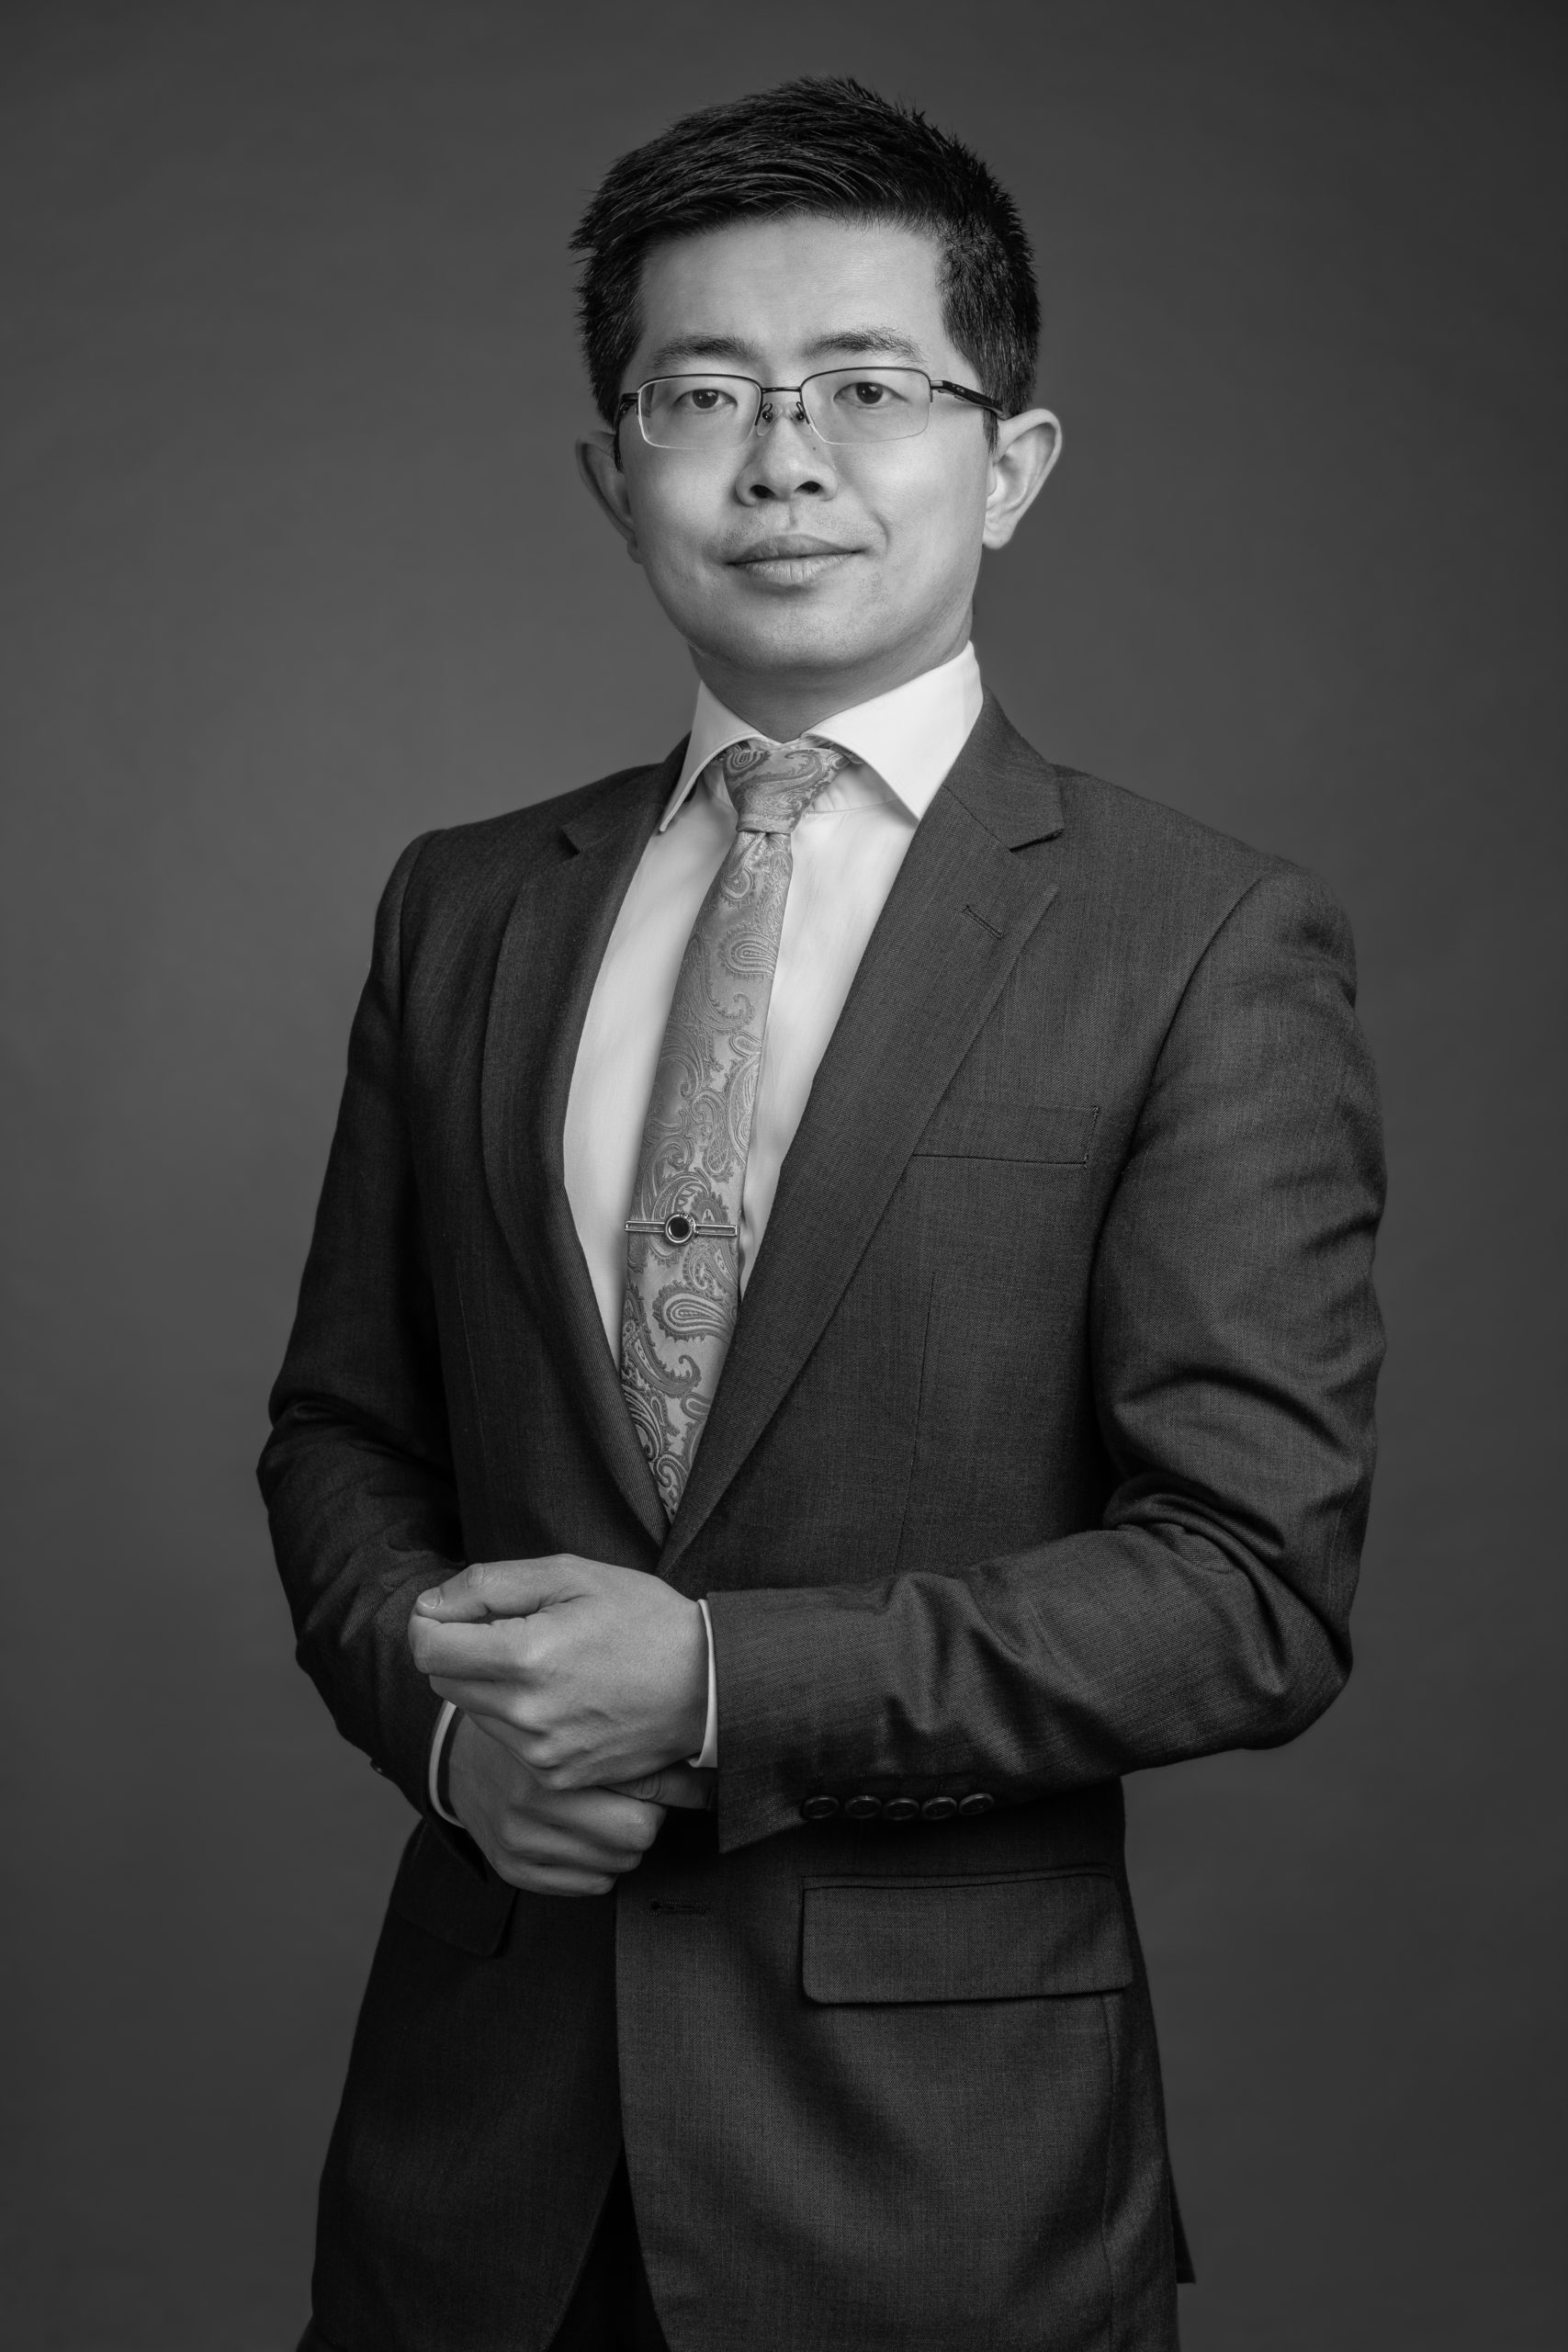 Morgan Zhang